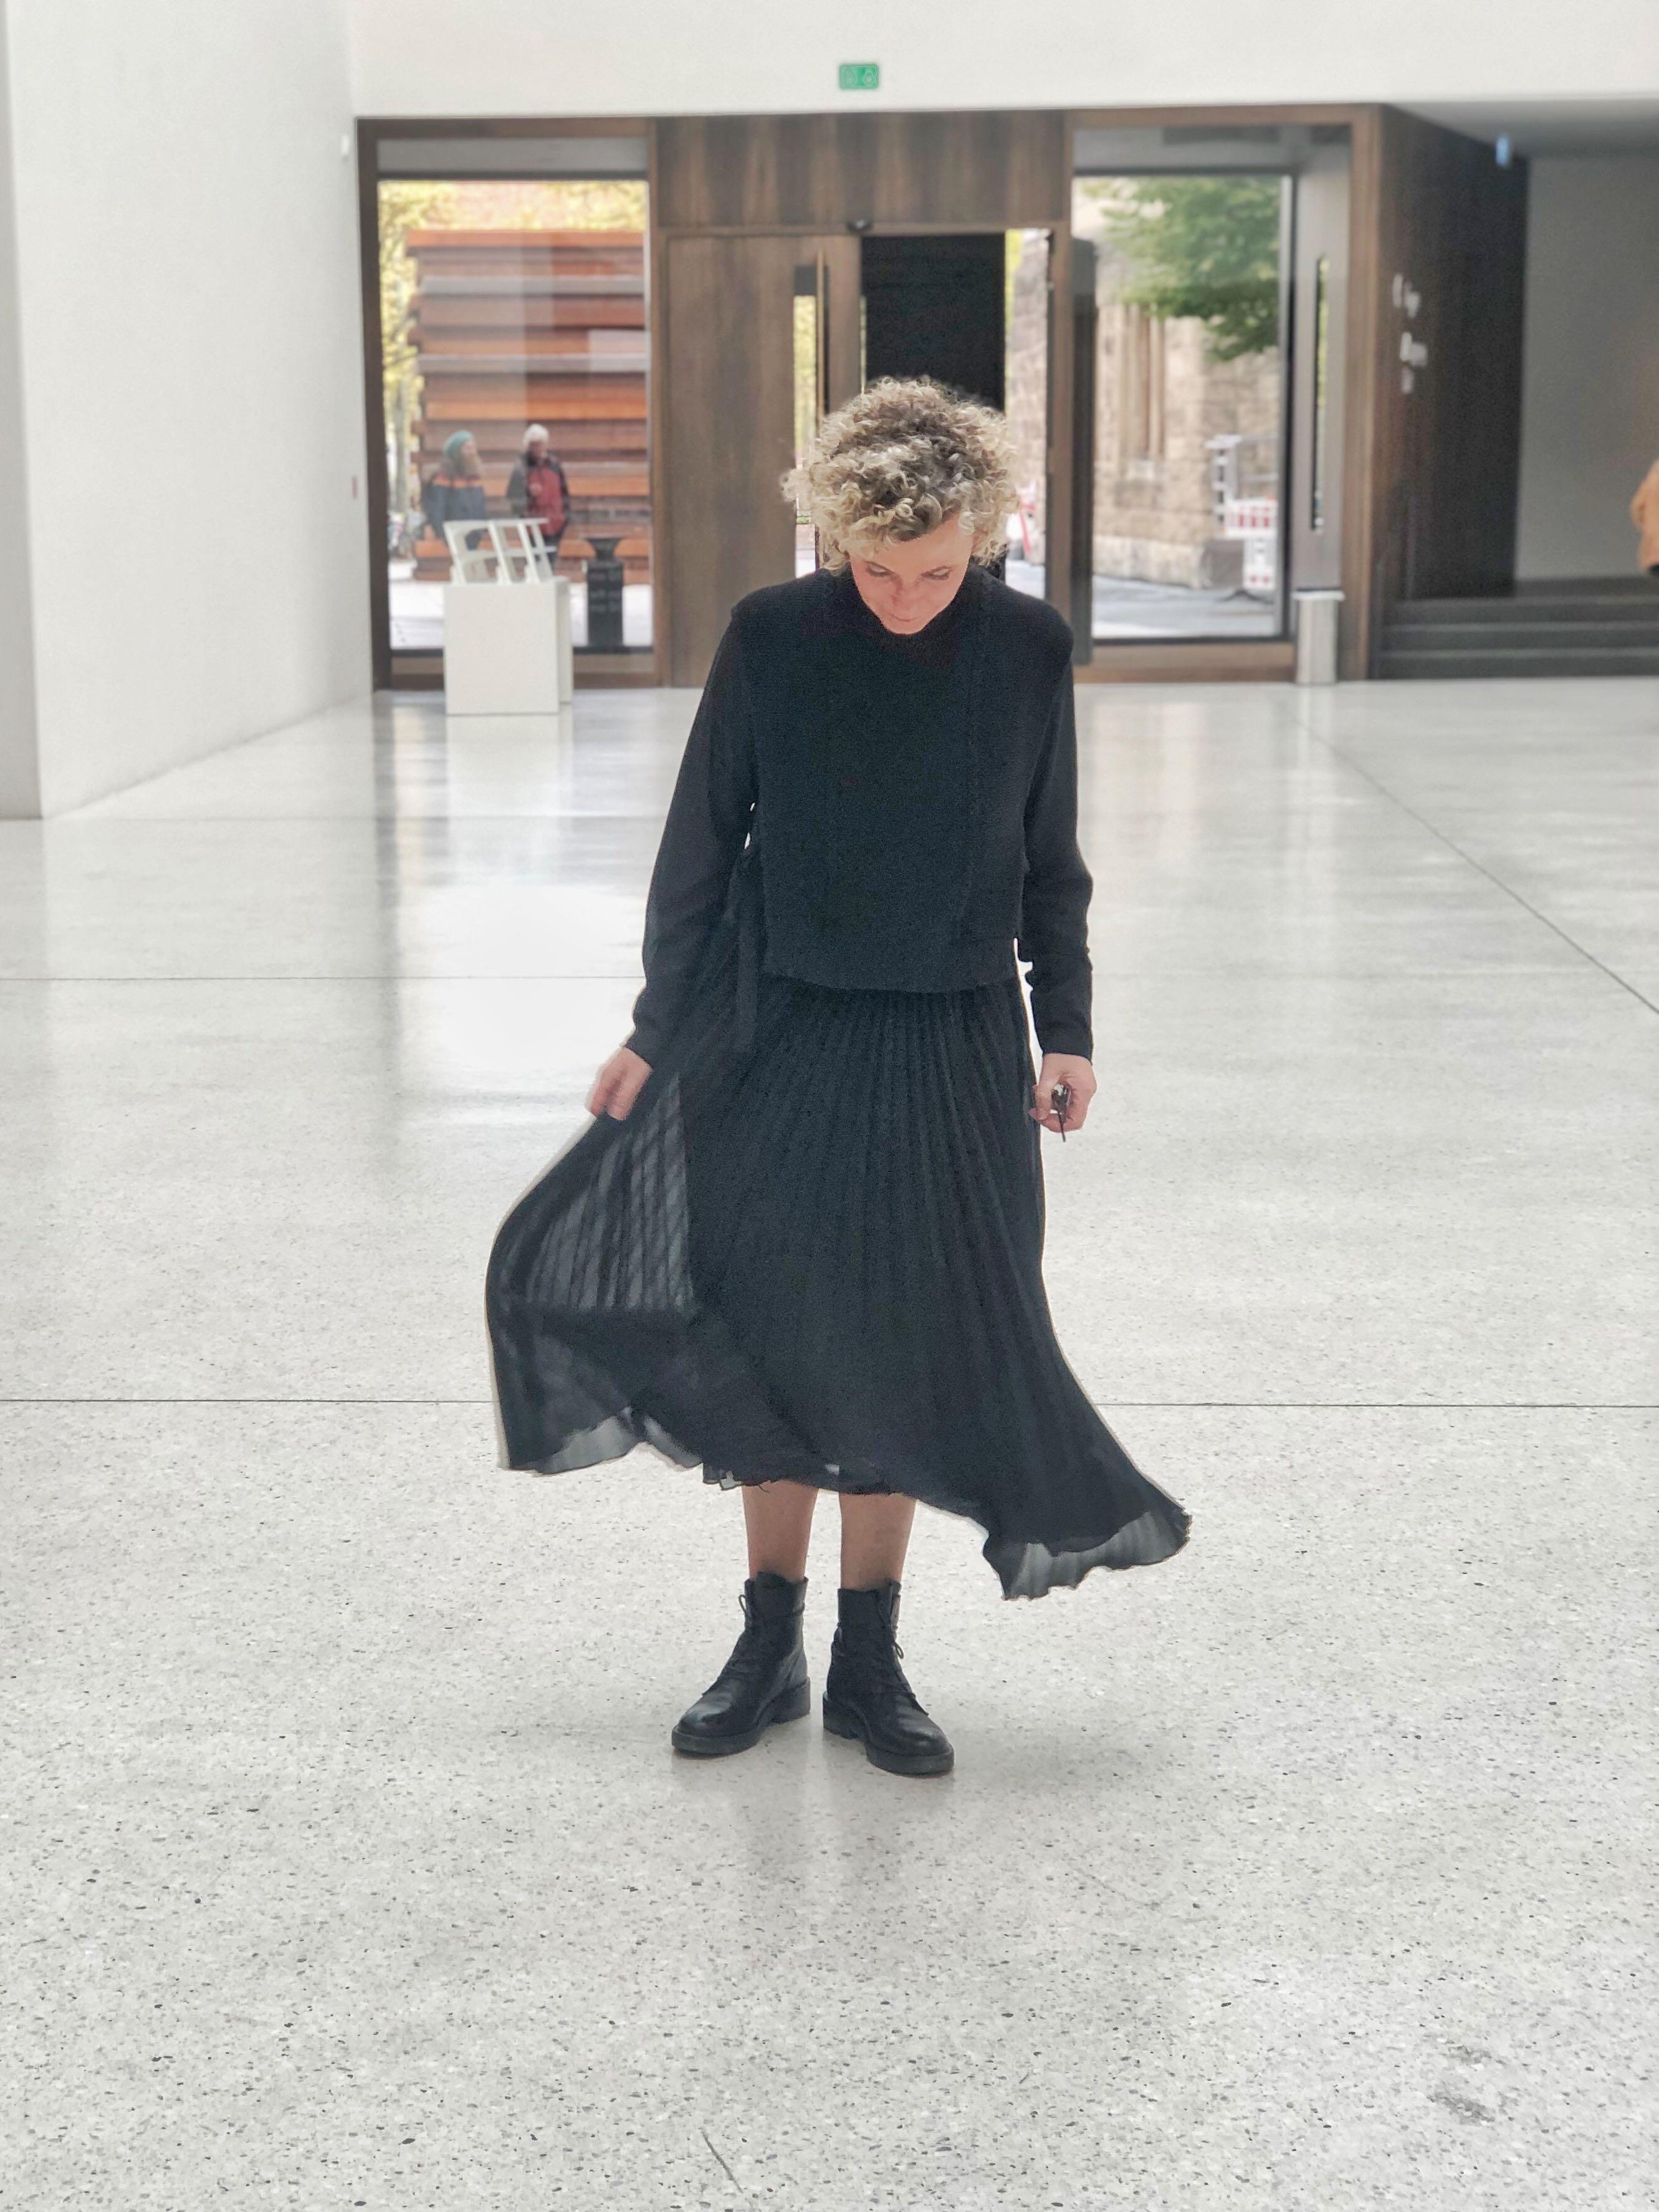 women9style 9, RIANI, Rianista, Boots, schwarzes Kleid, Herbst9019 ...